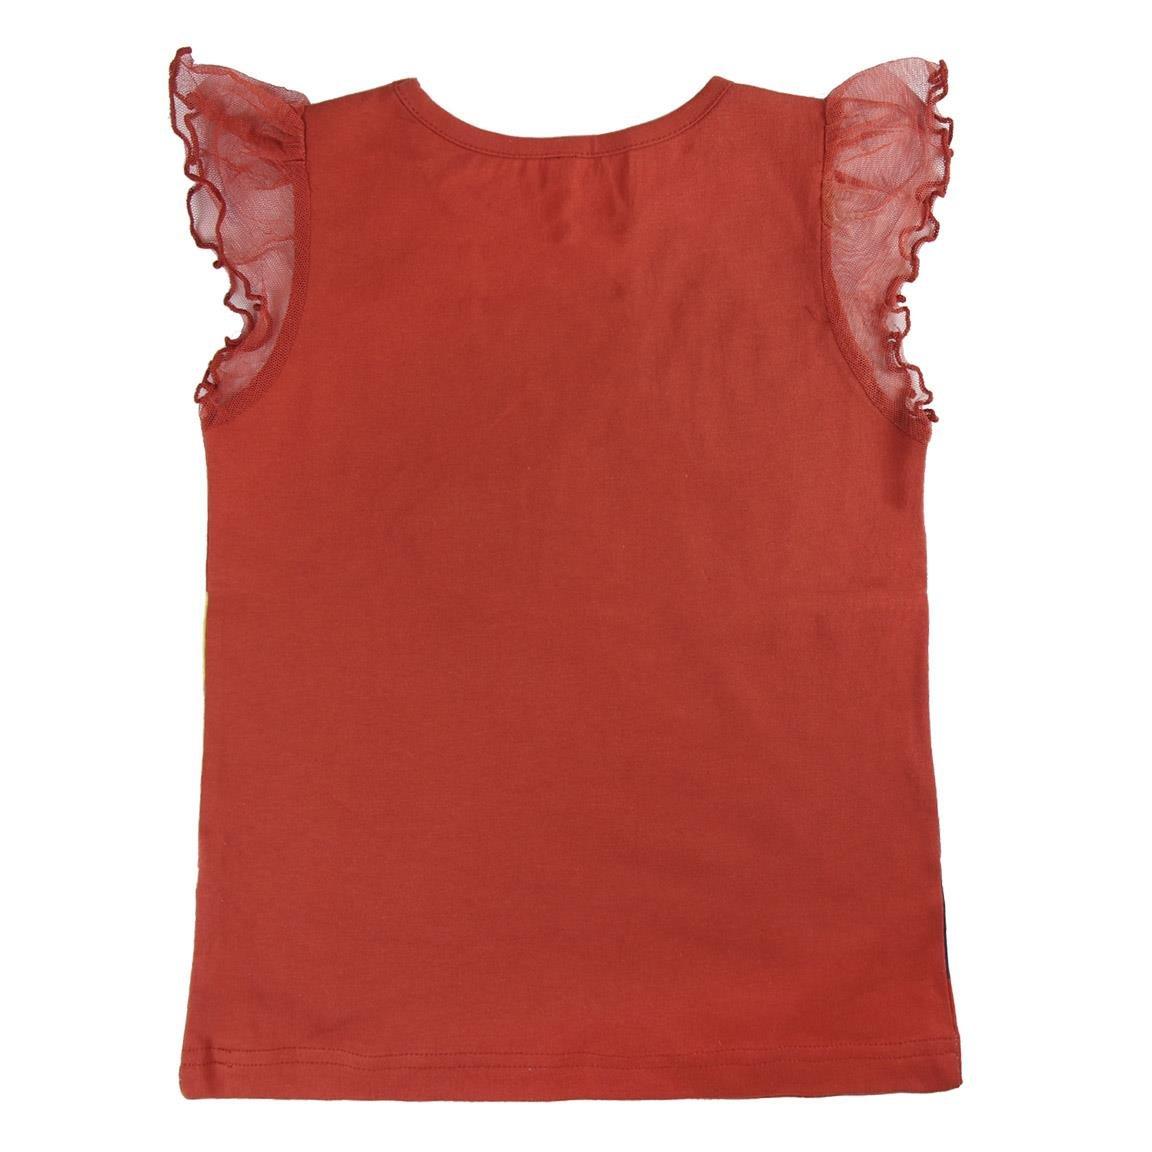 DC Comics Wonder Woman 2200002639 T-Shirt Cotone Maglia Paillettes 4 Anni Super Hero Girls